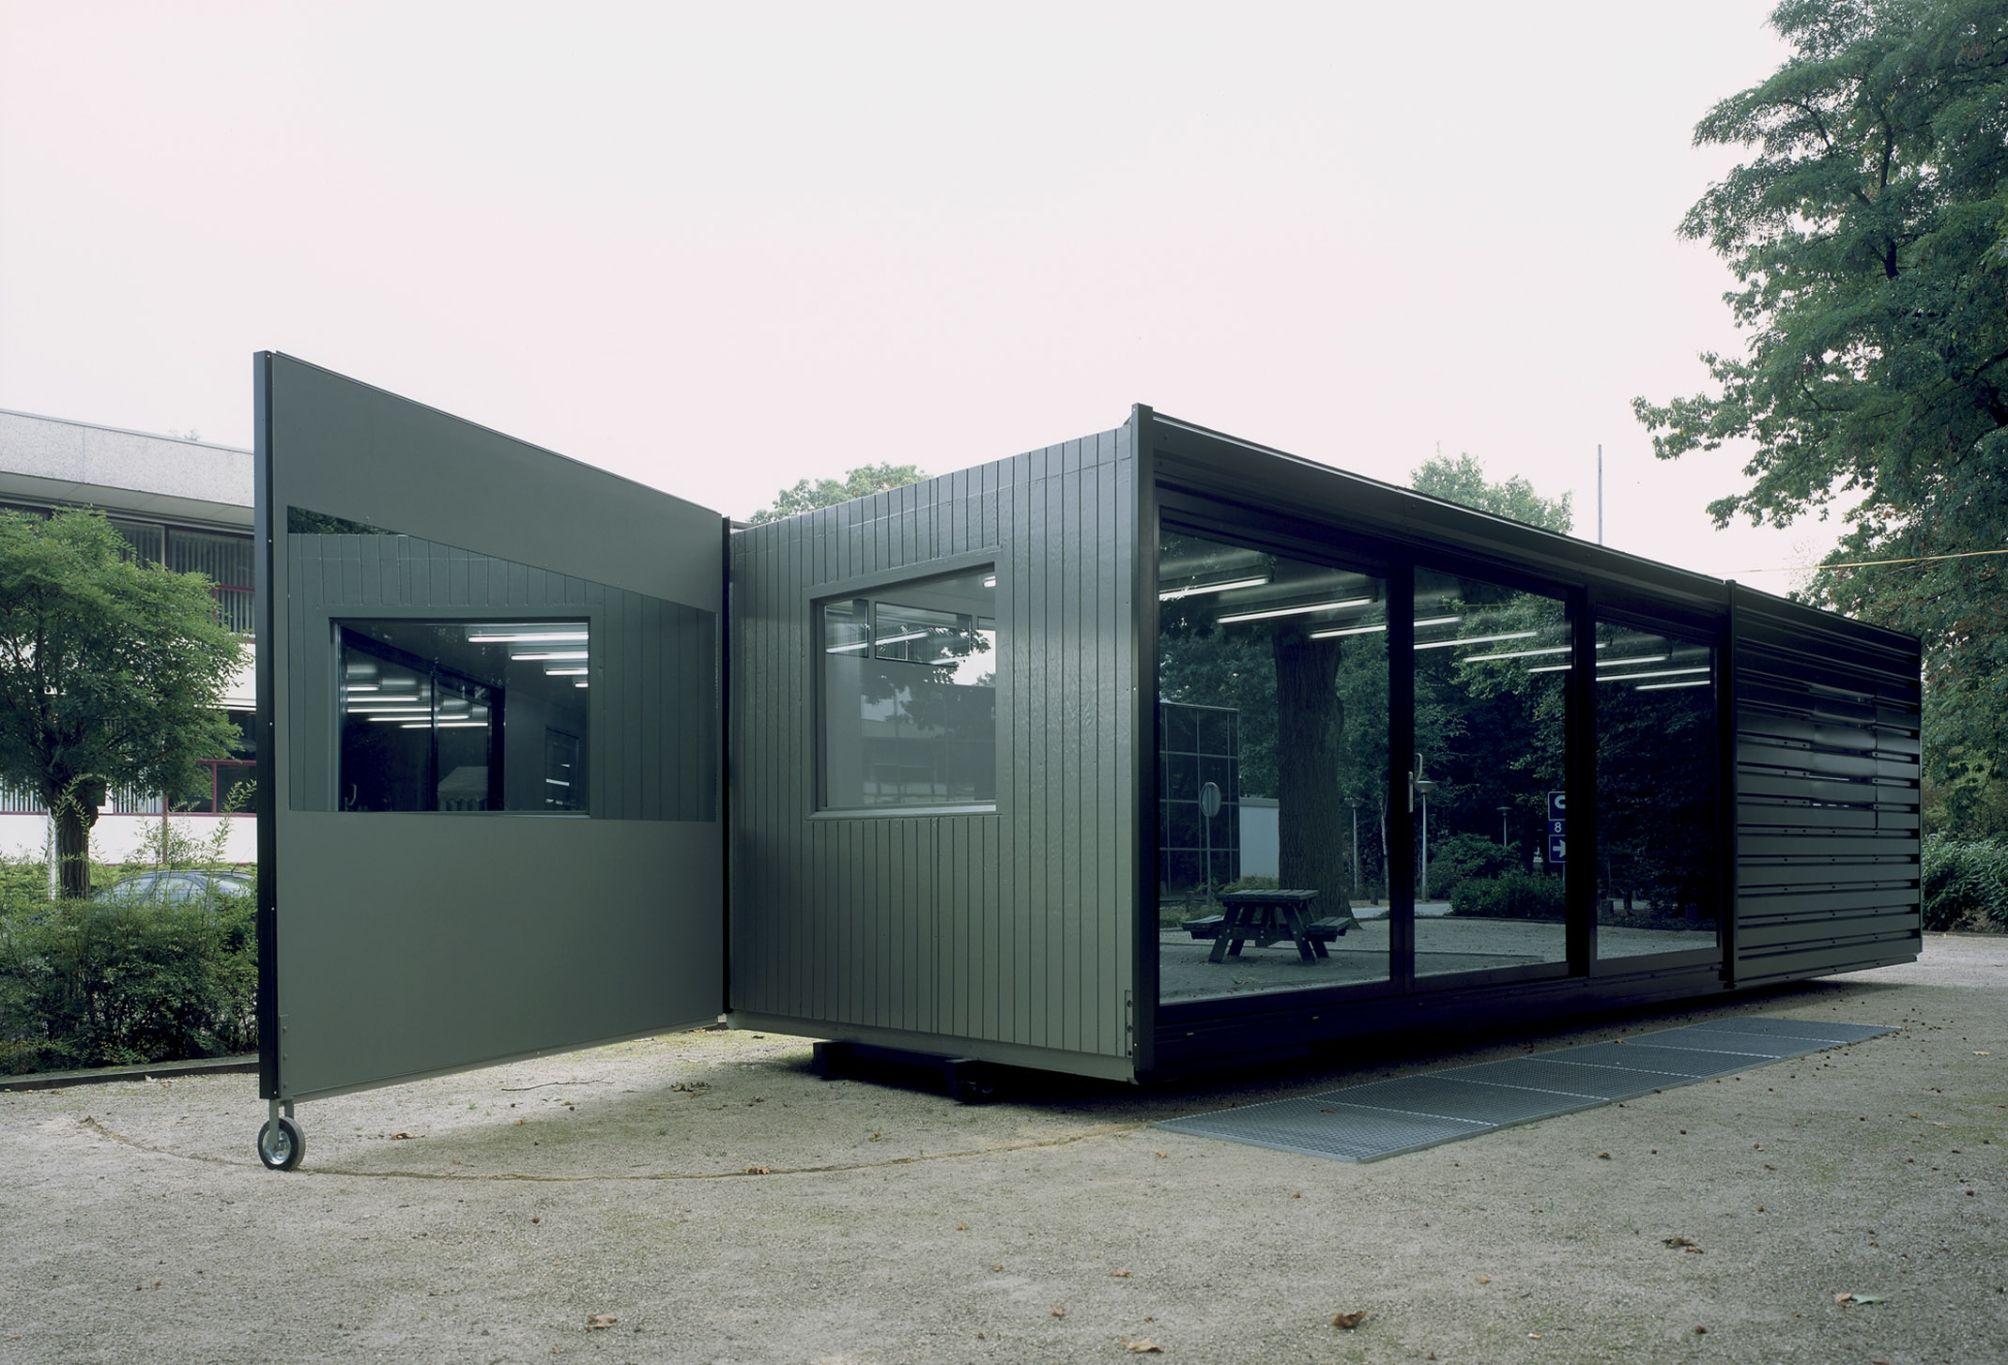 Mobile Studio Lucas Lenglet Architecture, Outdoor